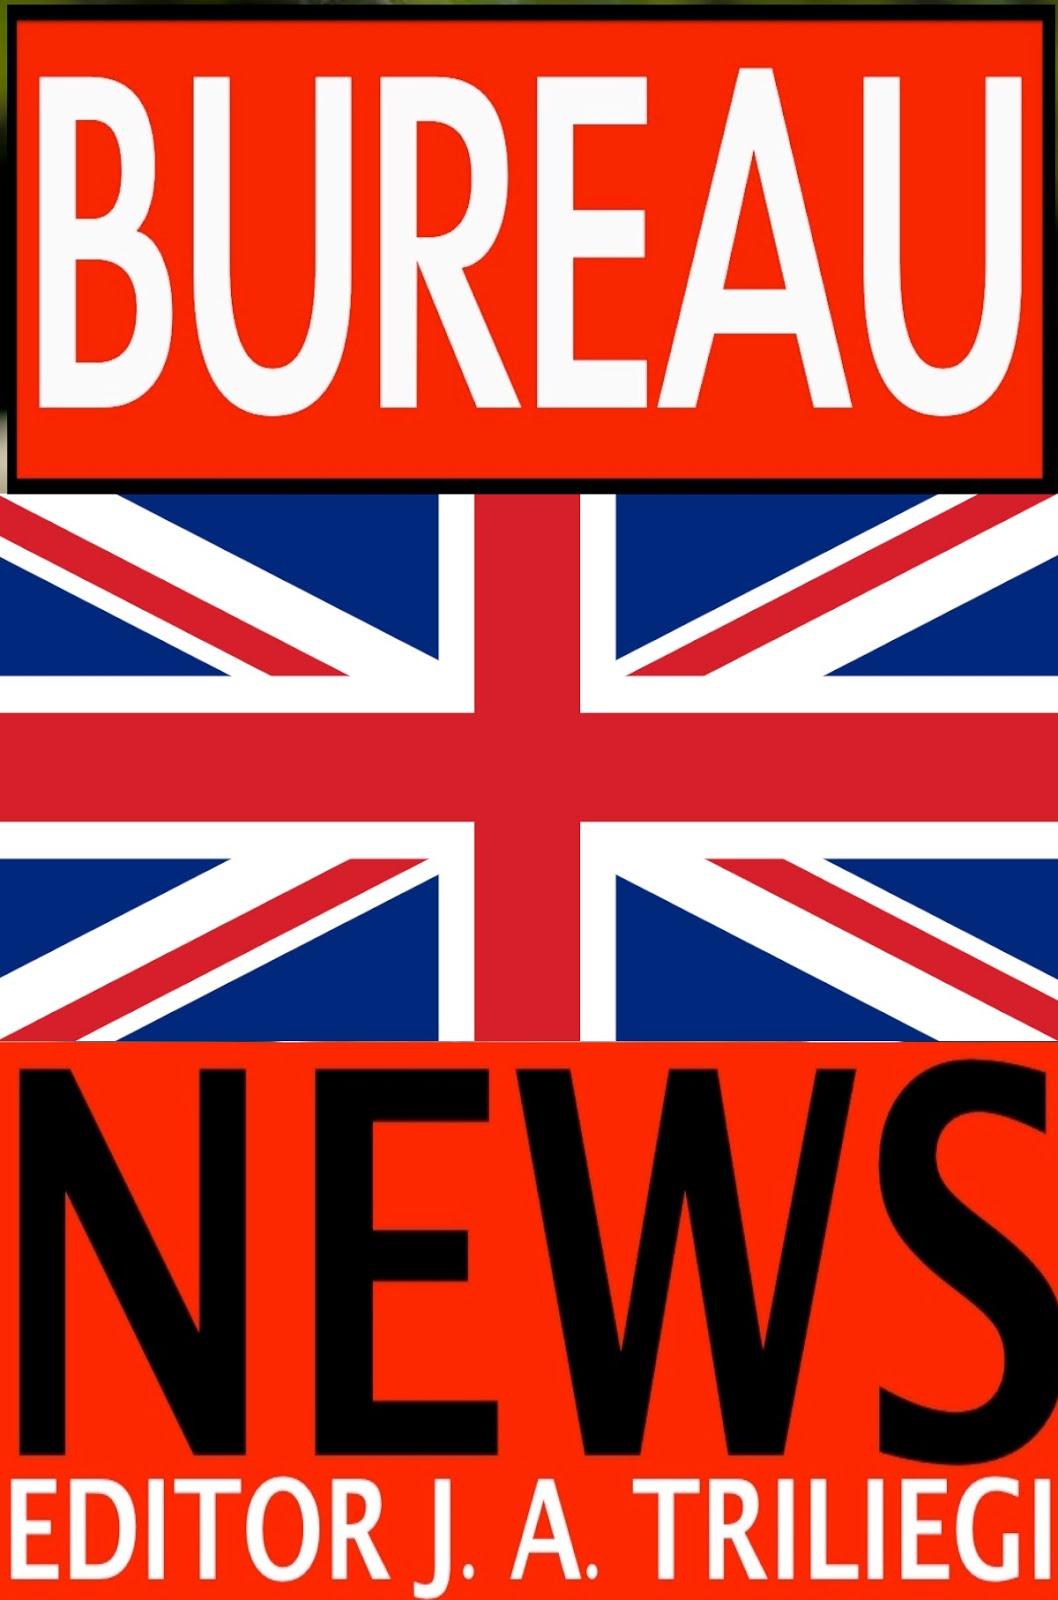 BUREAU NEWS IN THE UK